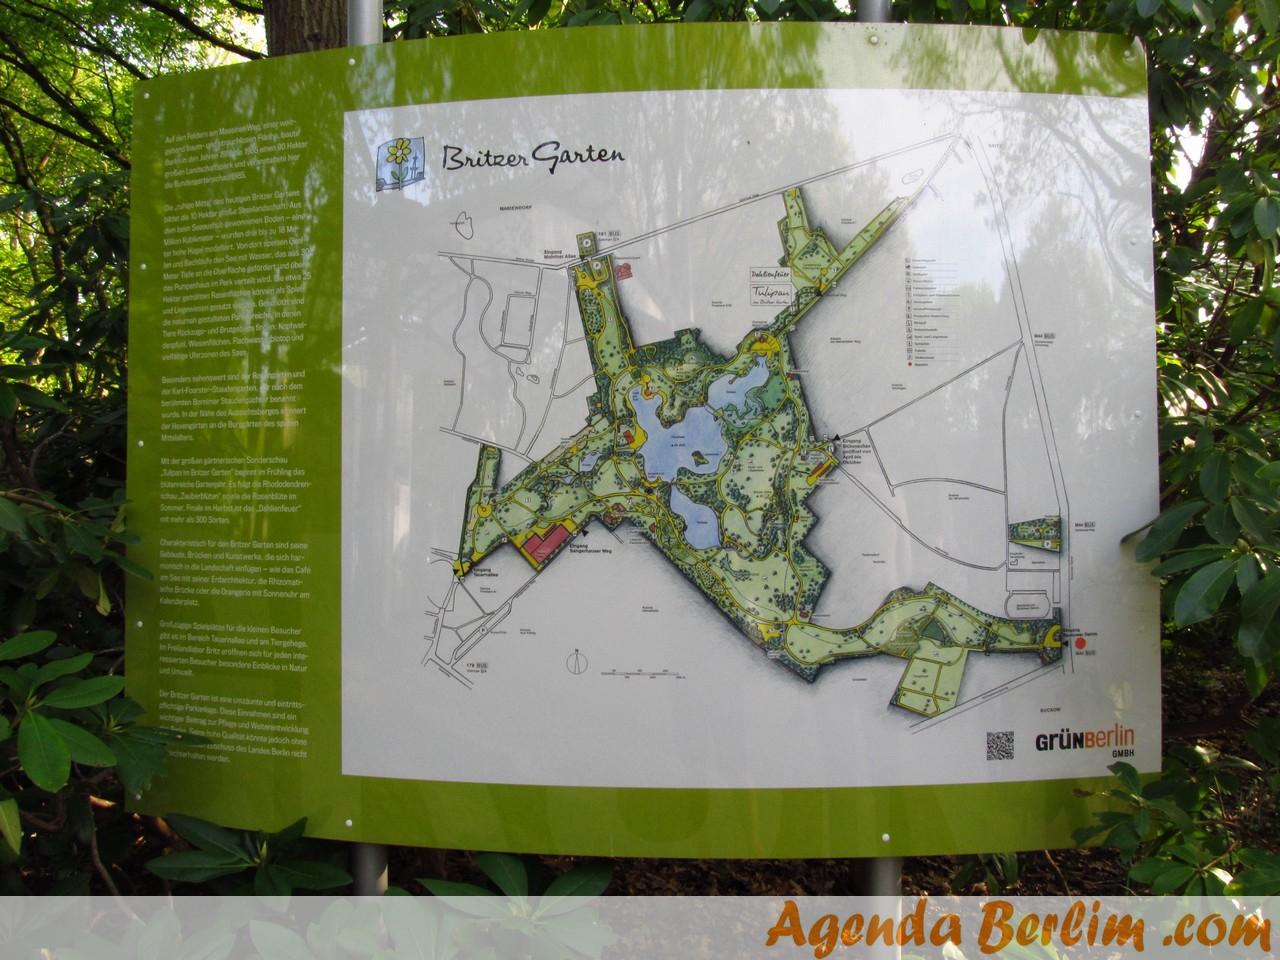 Mapa do Britzer Garten - AgendaBerlim.com